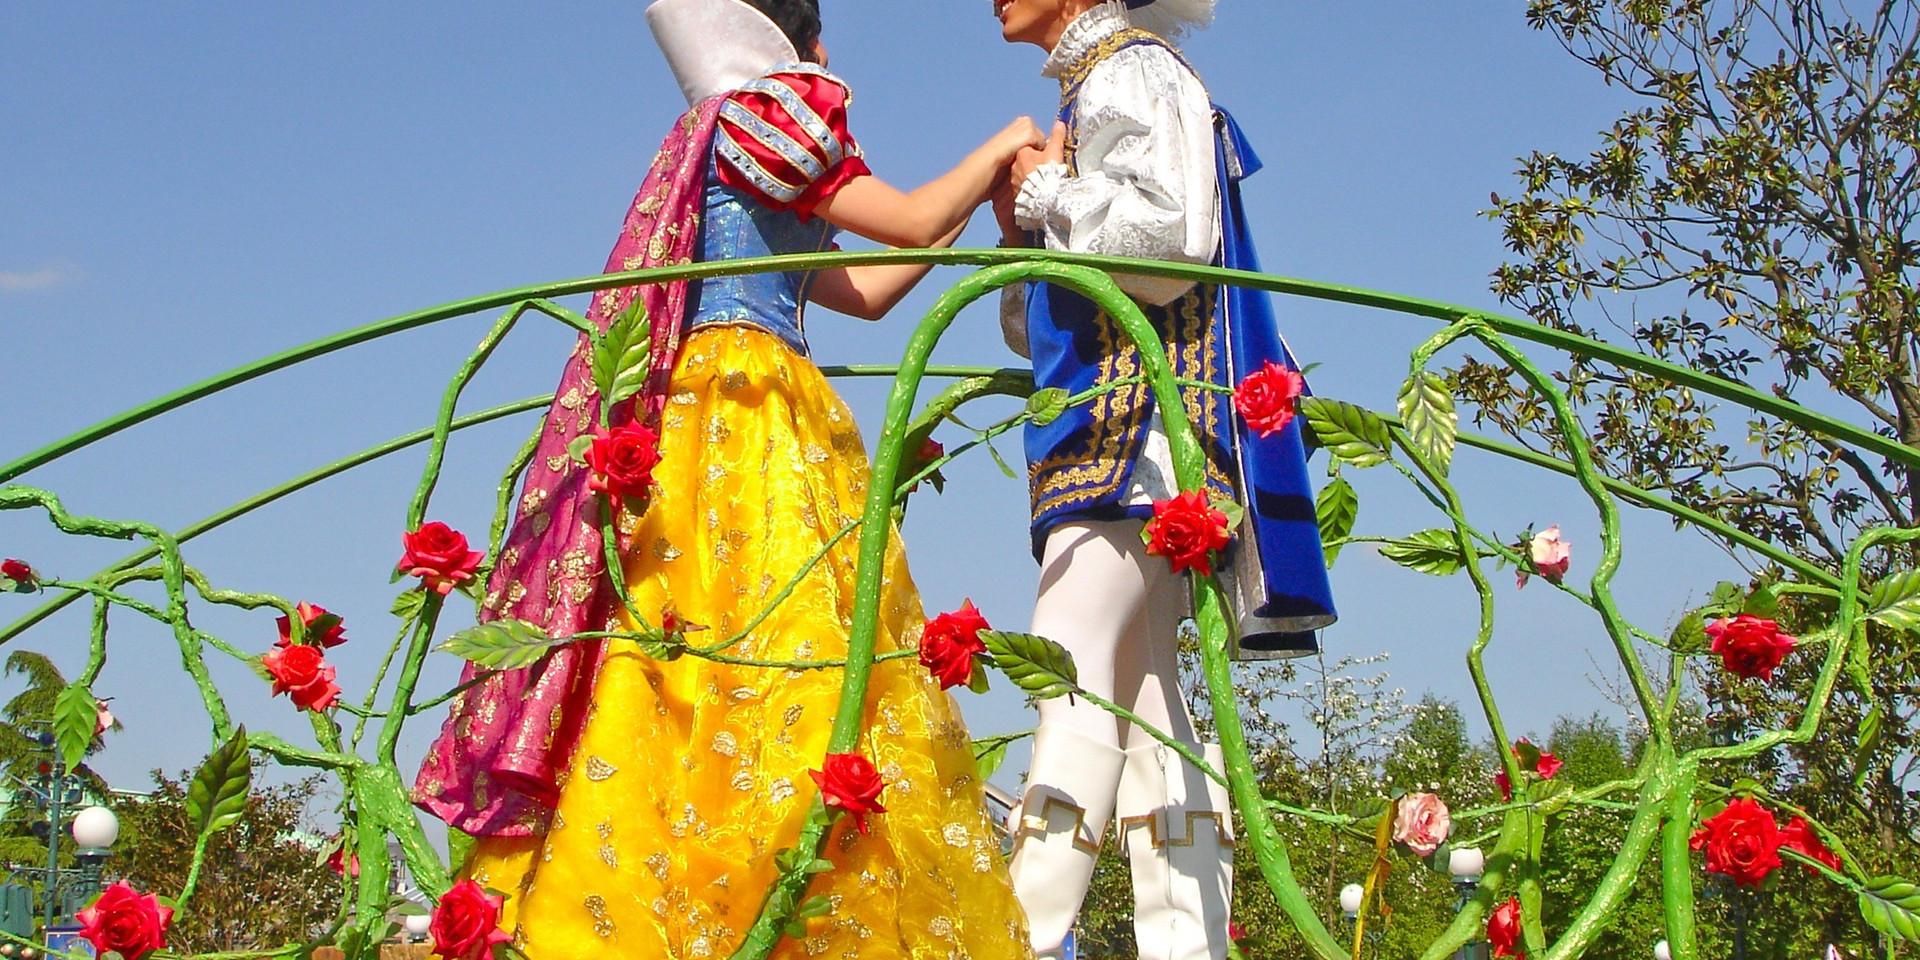 fairy-tale-1788209.jpg